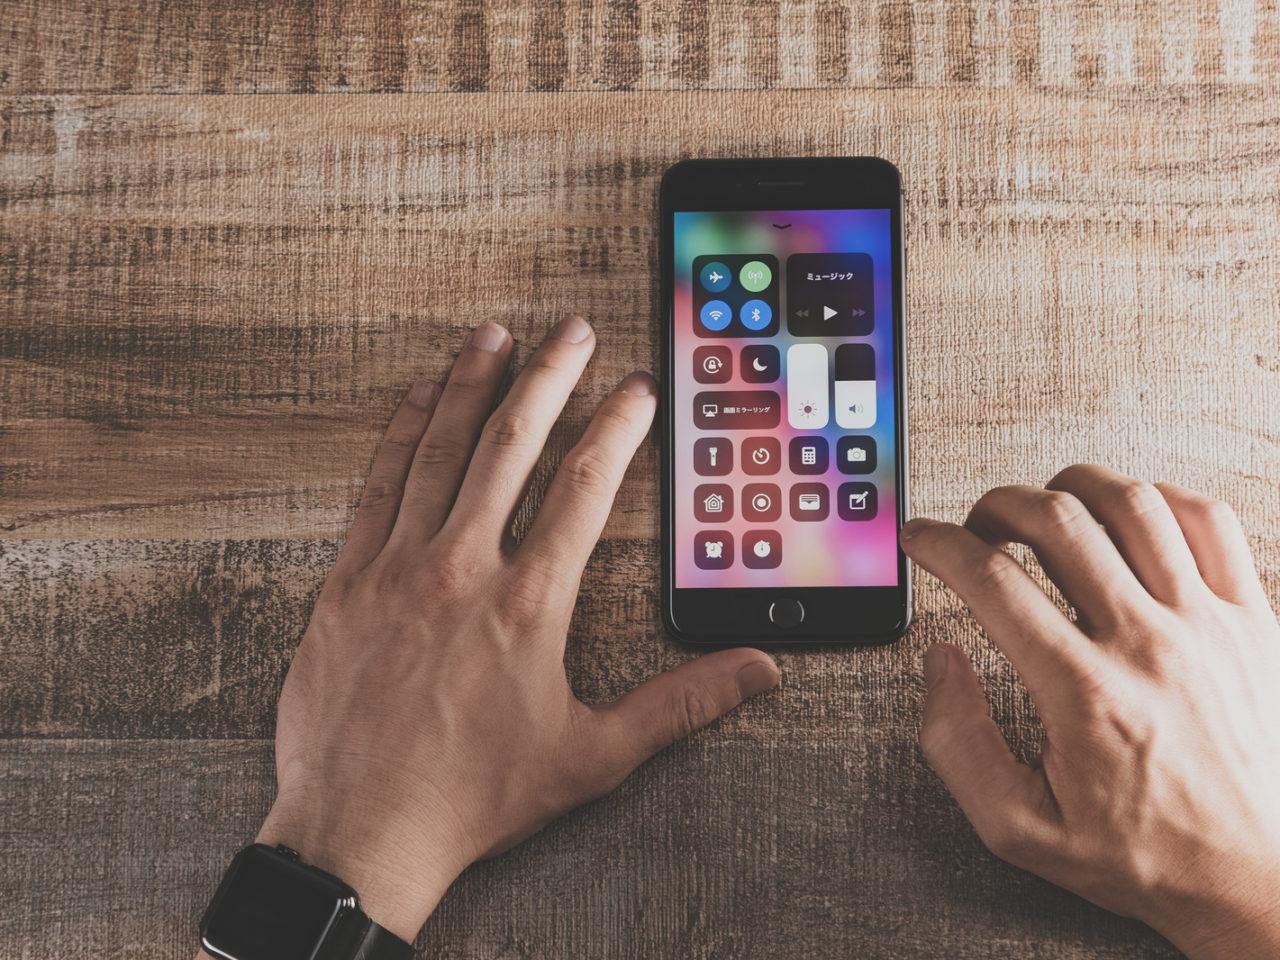 iPhoneの背面タップの対応機種・端末は?iPhone8やiPadやiphone7は対応?【iOS14】のサムネイル画像